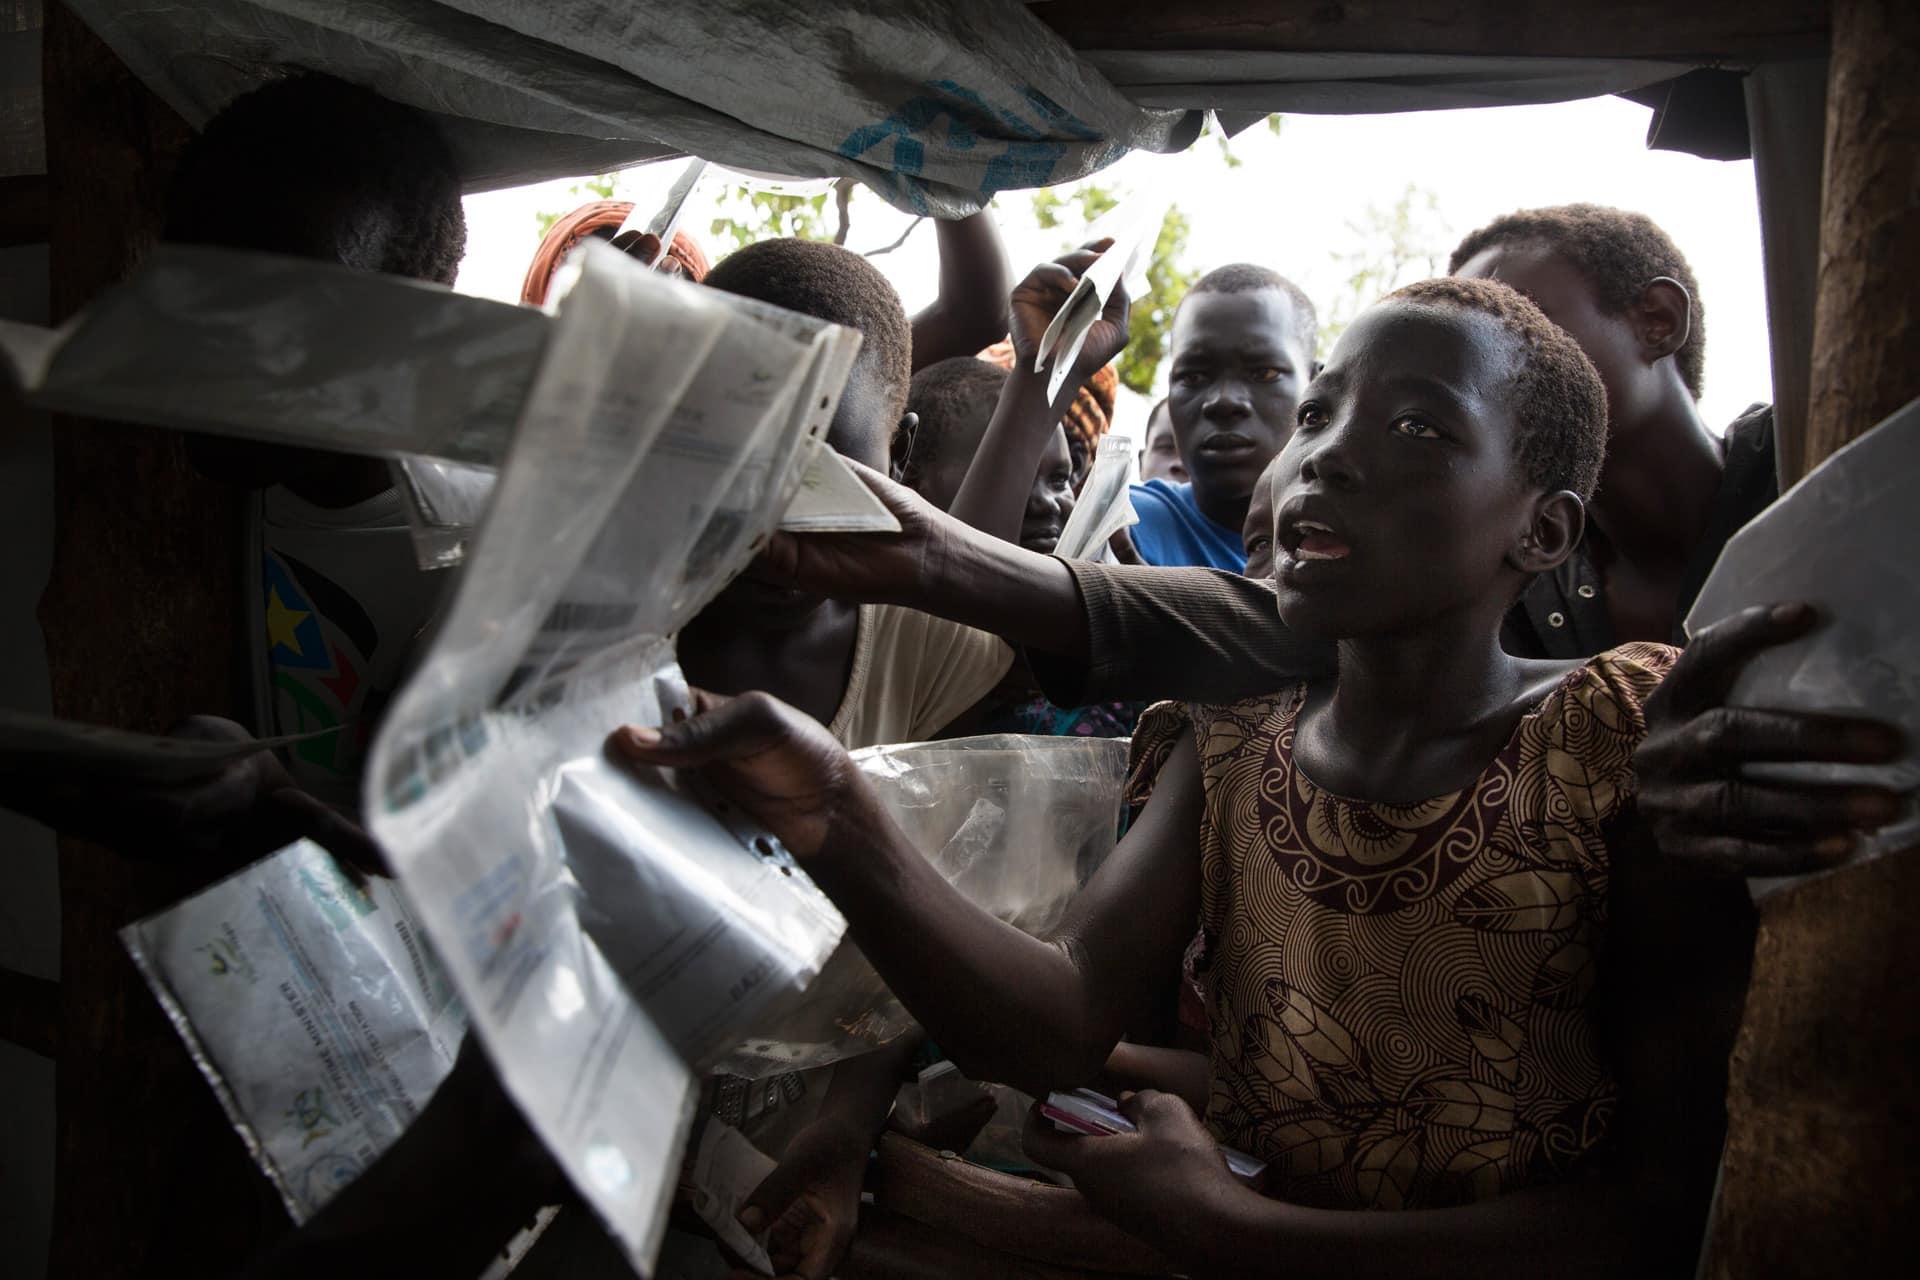 sudan_refugeecrisis009